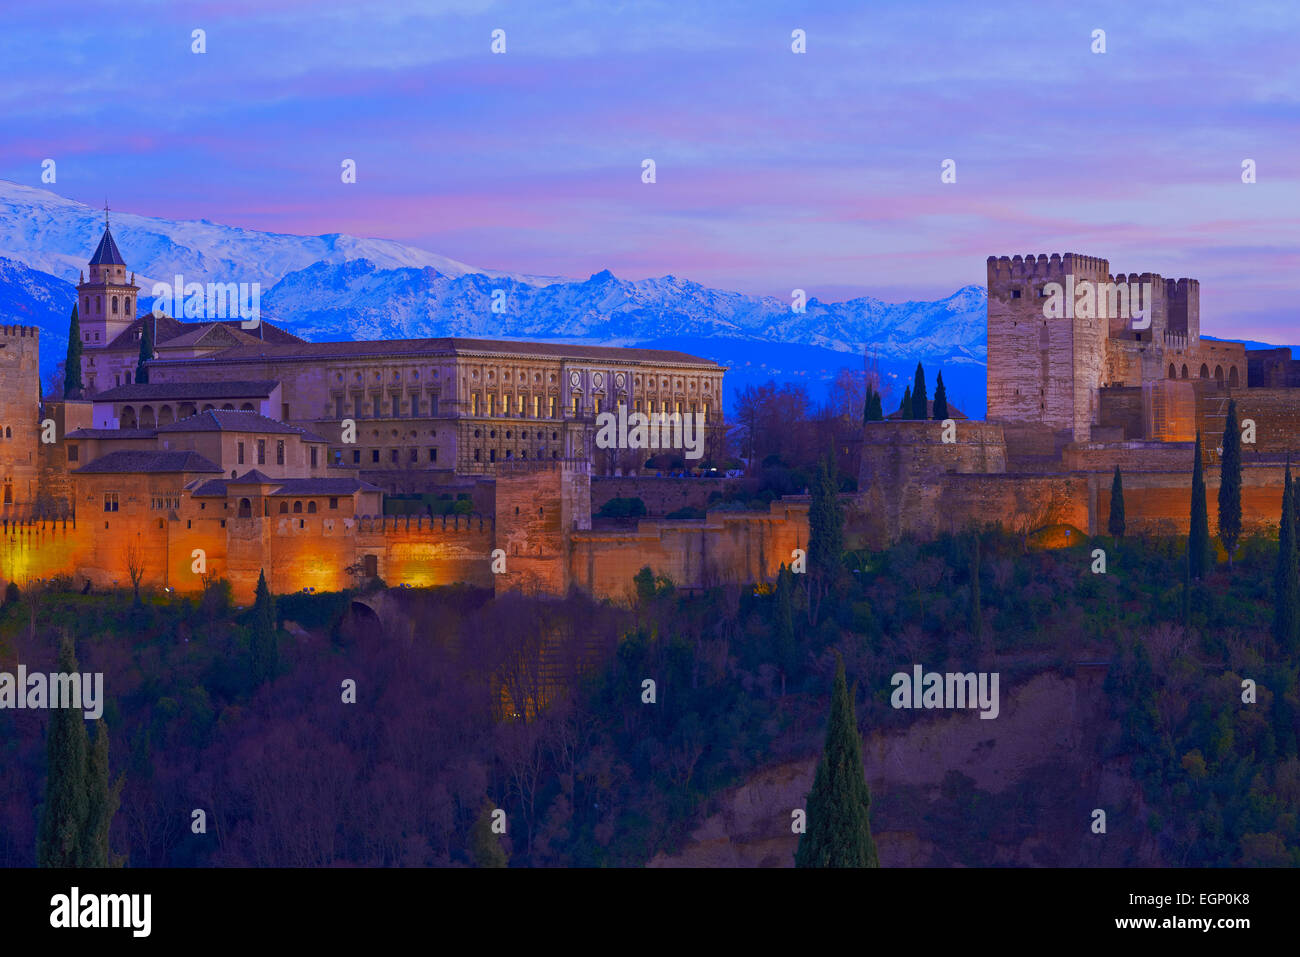 Alhambra, UNESCO World Heritage Site, Sierra Nevada and la Alhambra at Dusk, Granada, Andalusia, Spain Stock Photo